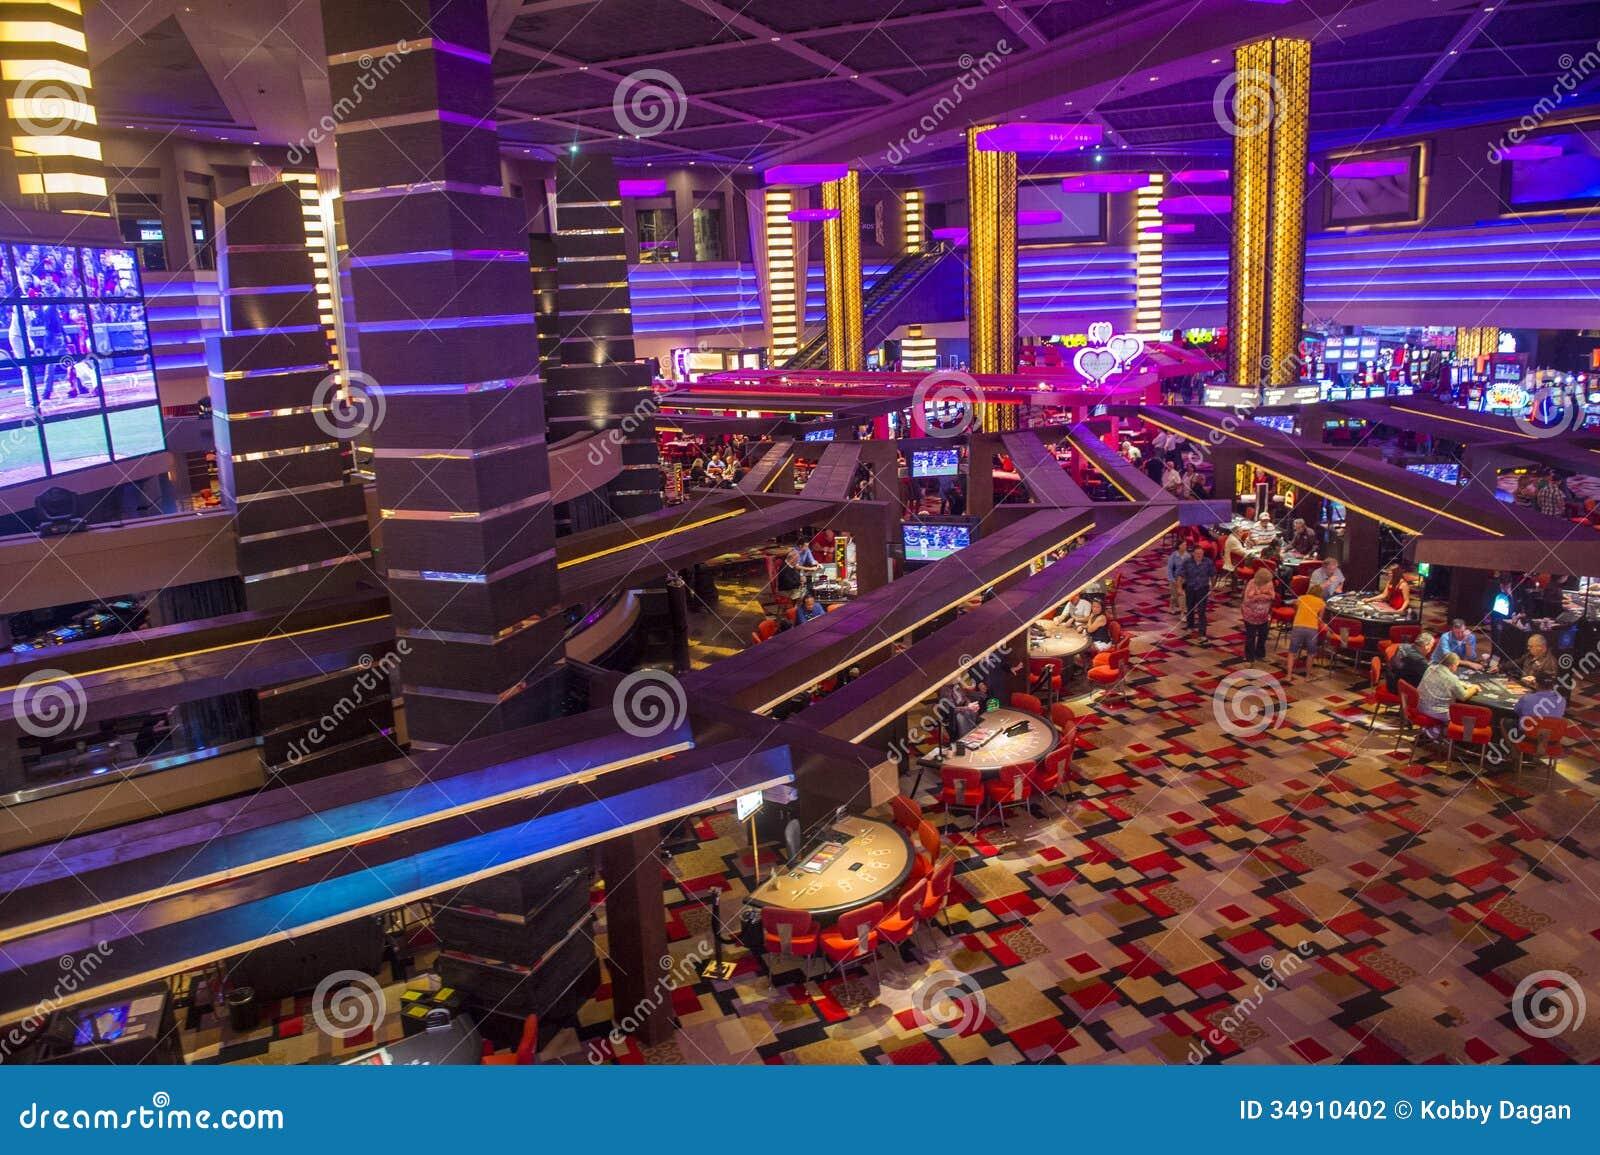 Planet 7 casino 10